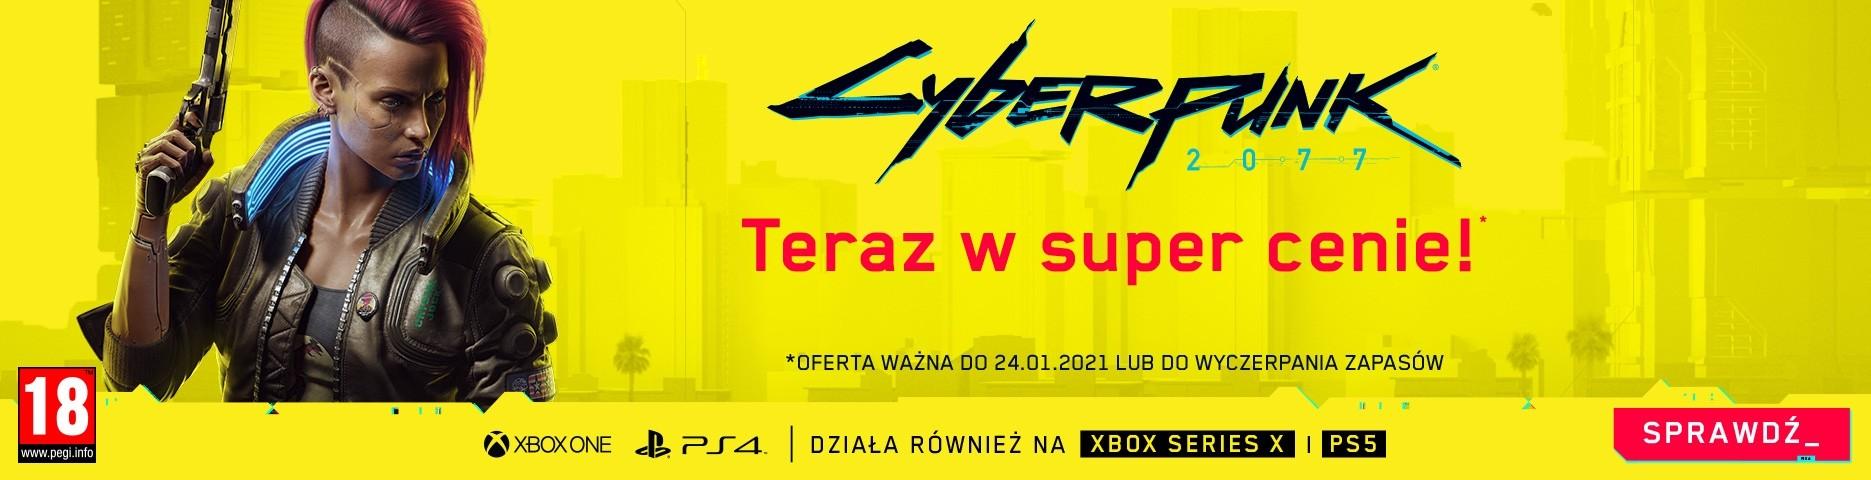 Promocja Cyberpunk 2077